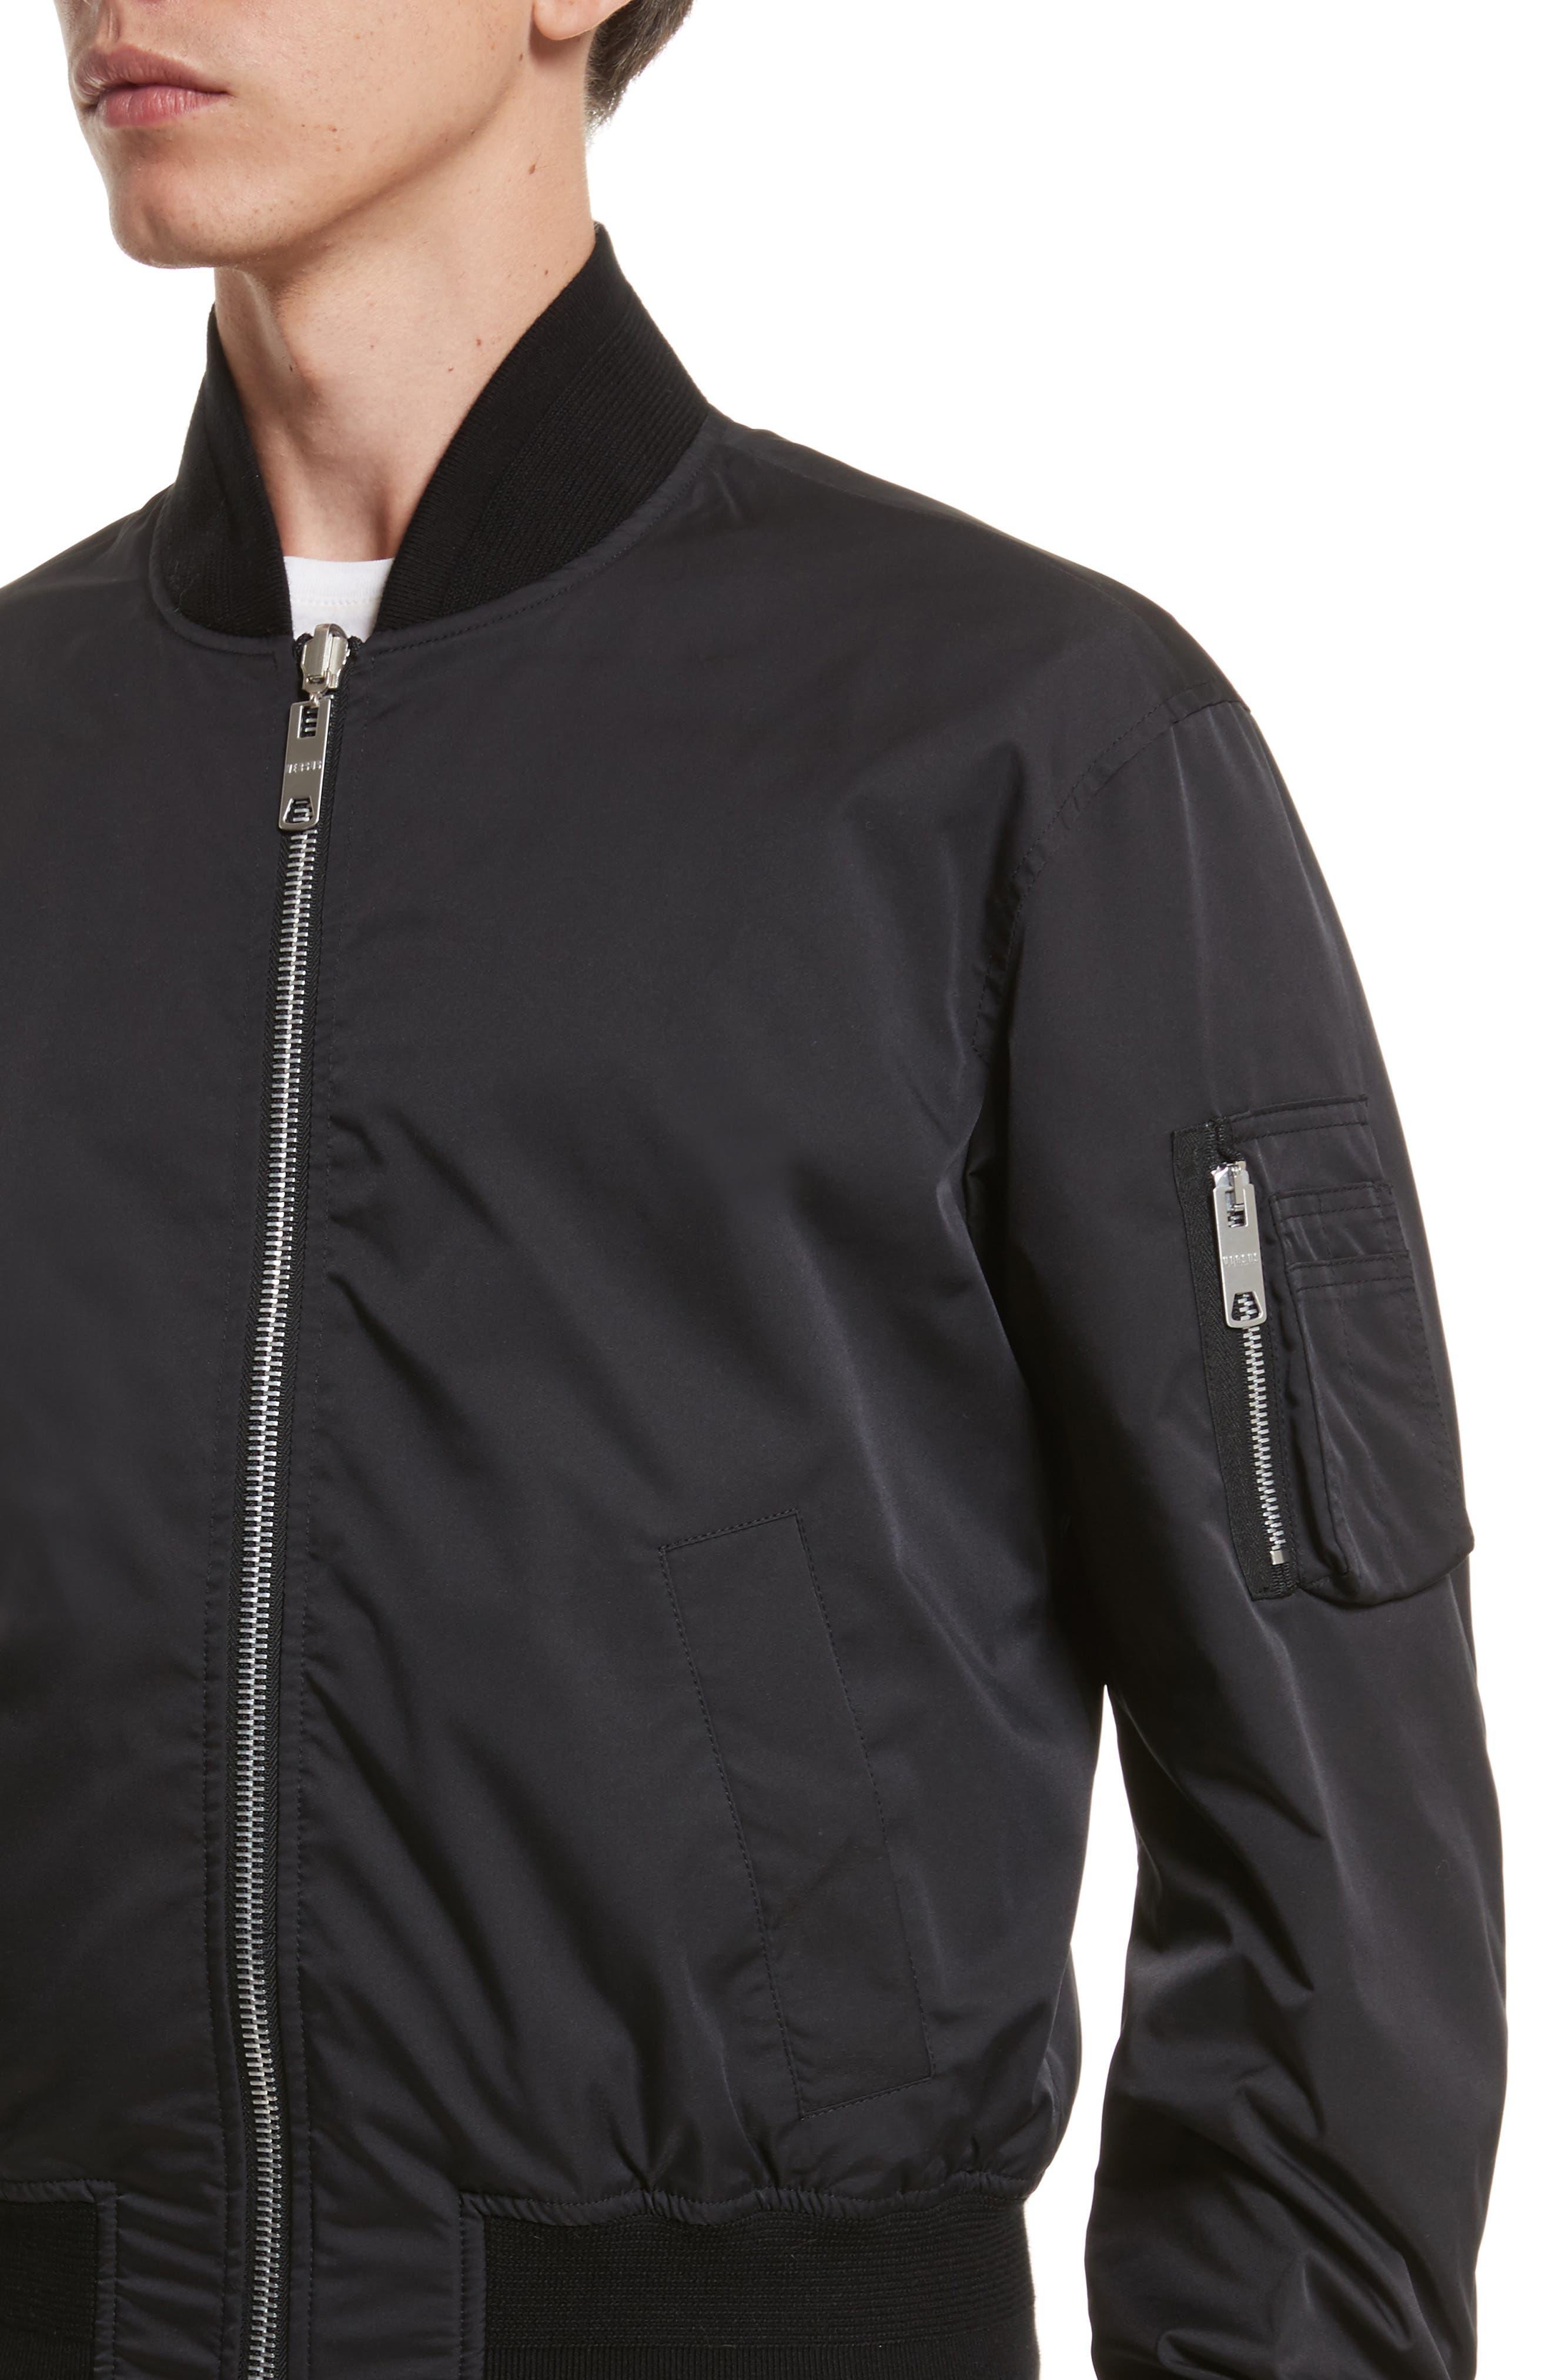 VERSUS by Versace Reversible Pinstripe Bomber Jacket,                             Alternate thumbnail 4, color,                             Black